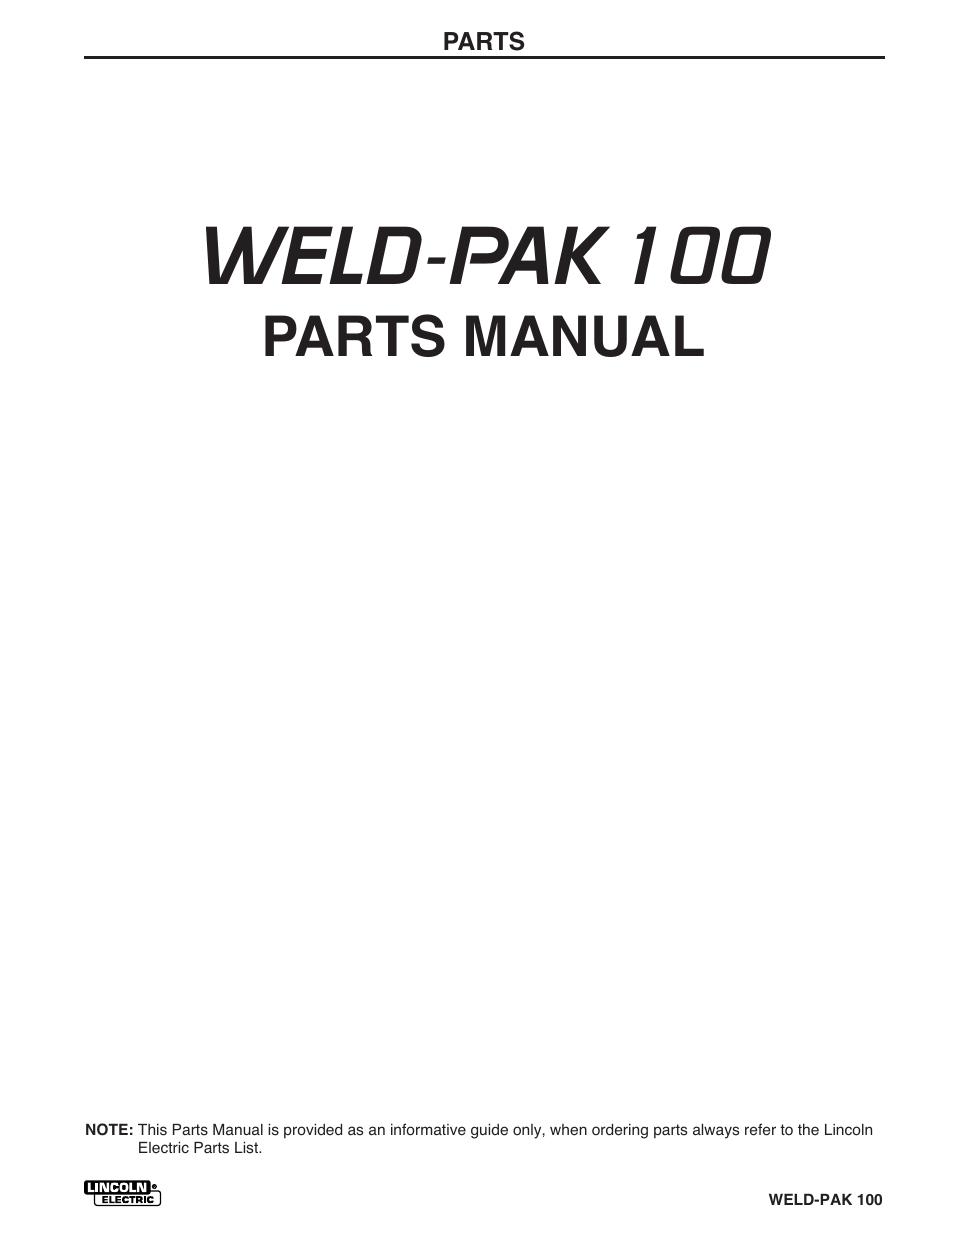 lincoln electric welder parts diagram lx torana tacho wiring weld pak 100 manual pack plus im546 user page 47 60